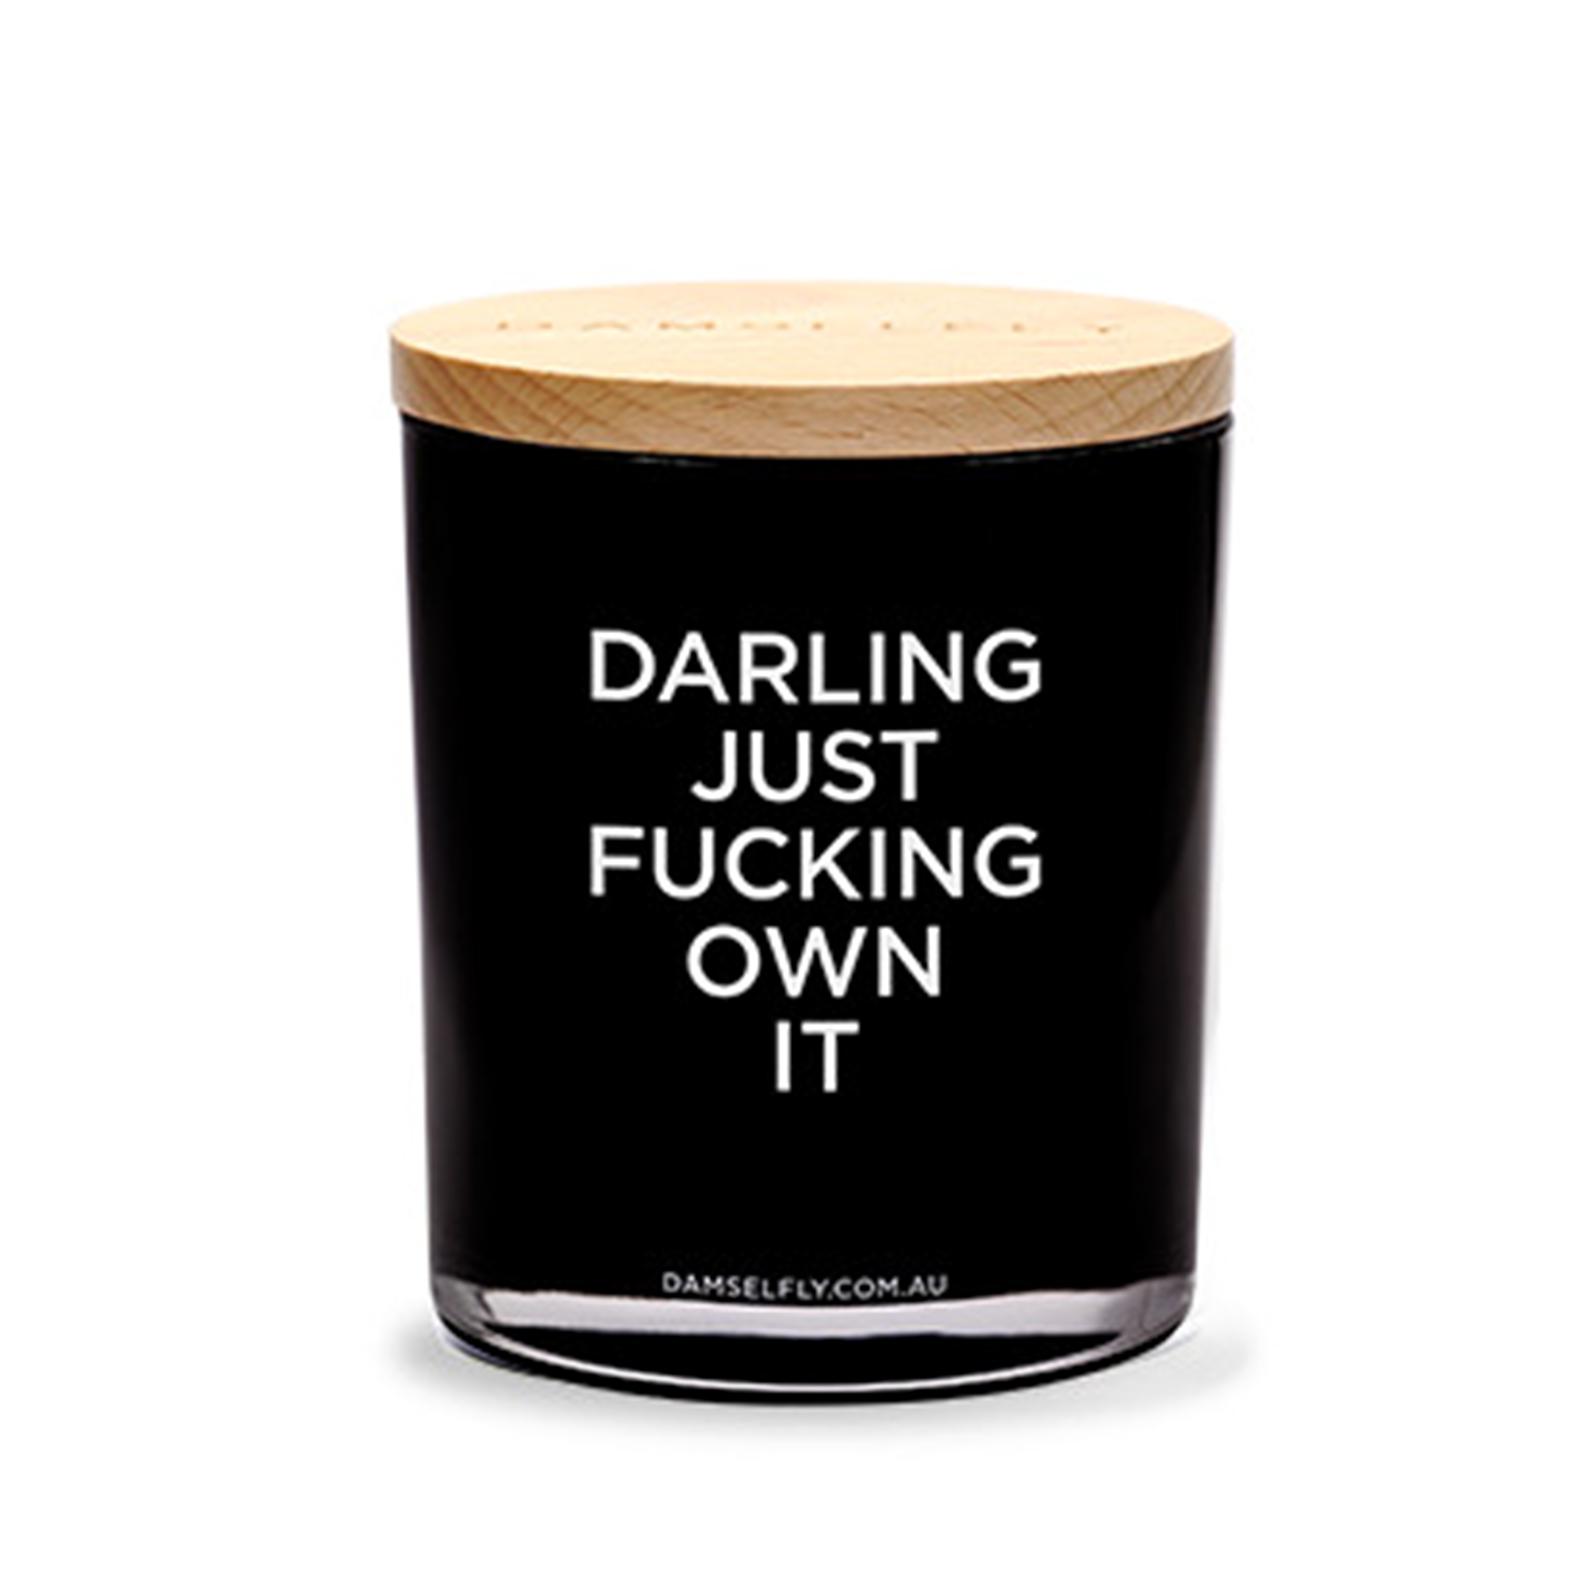 """Darling Just Fucking Own It"" Australia natural made, ""Delilah"" aromas candles 400g"